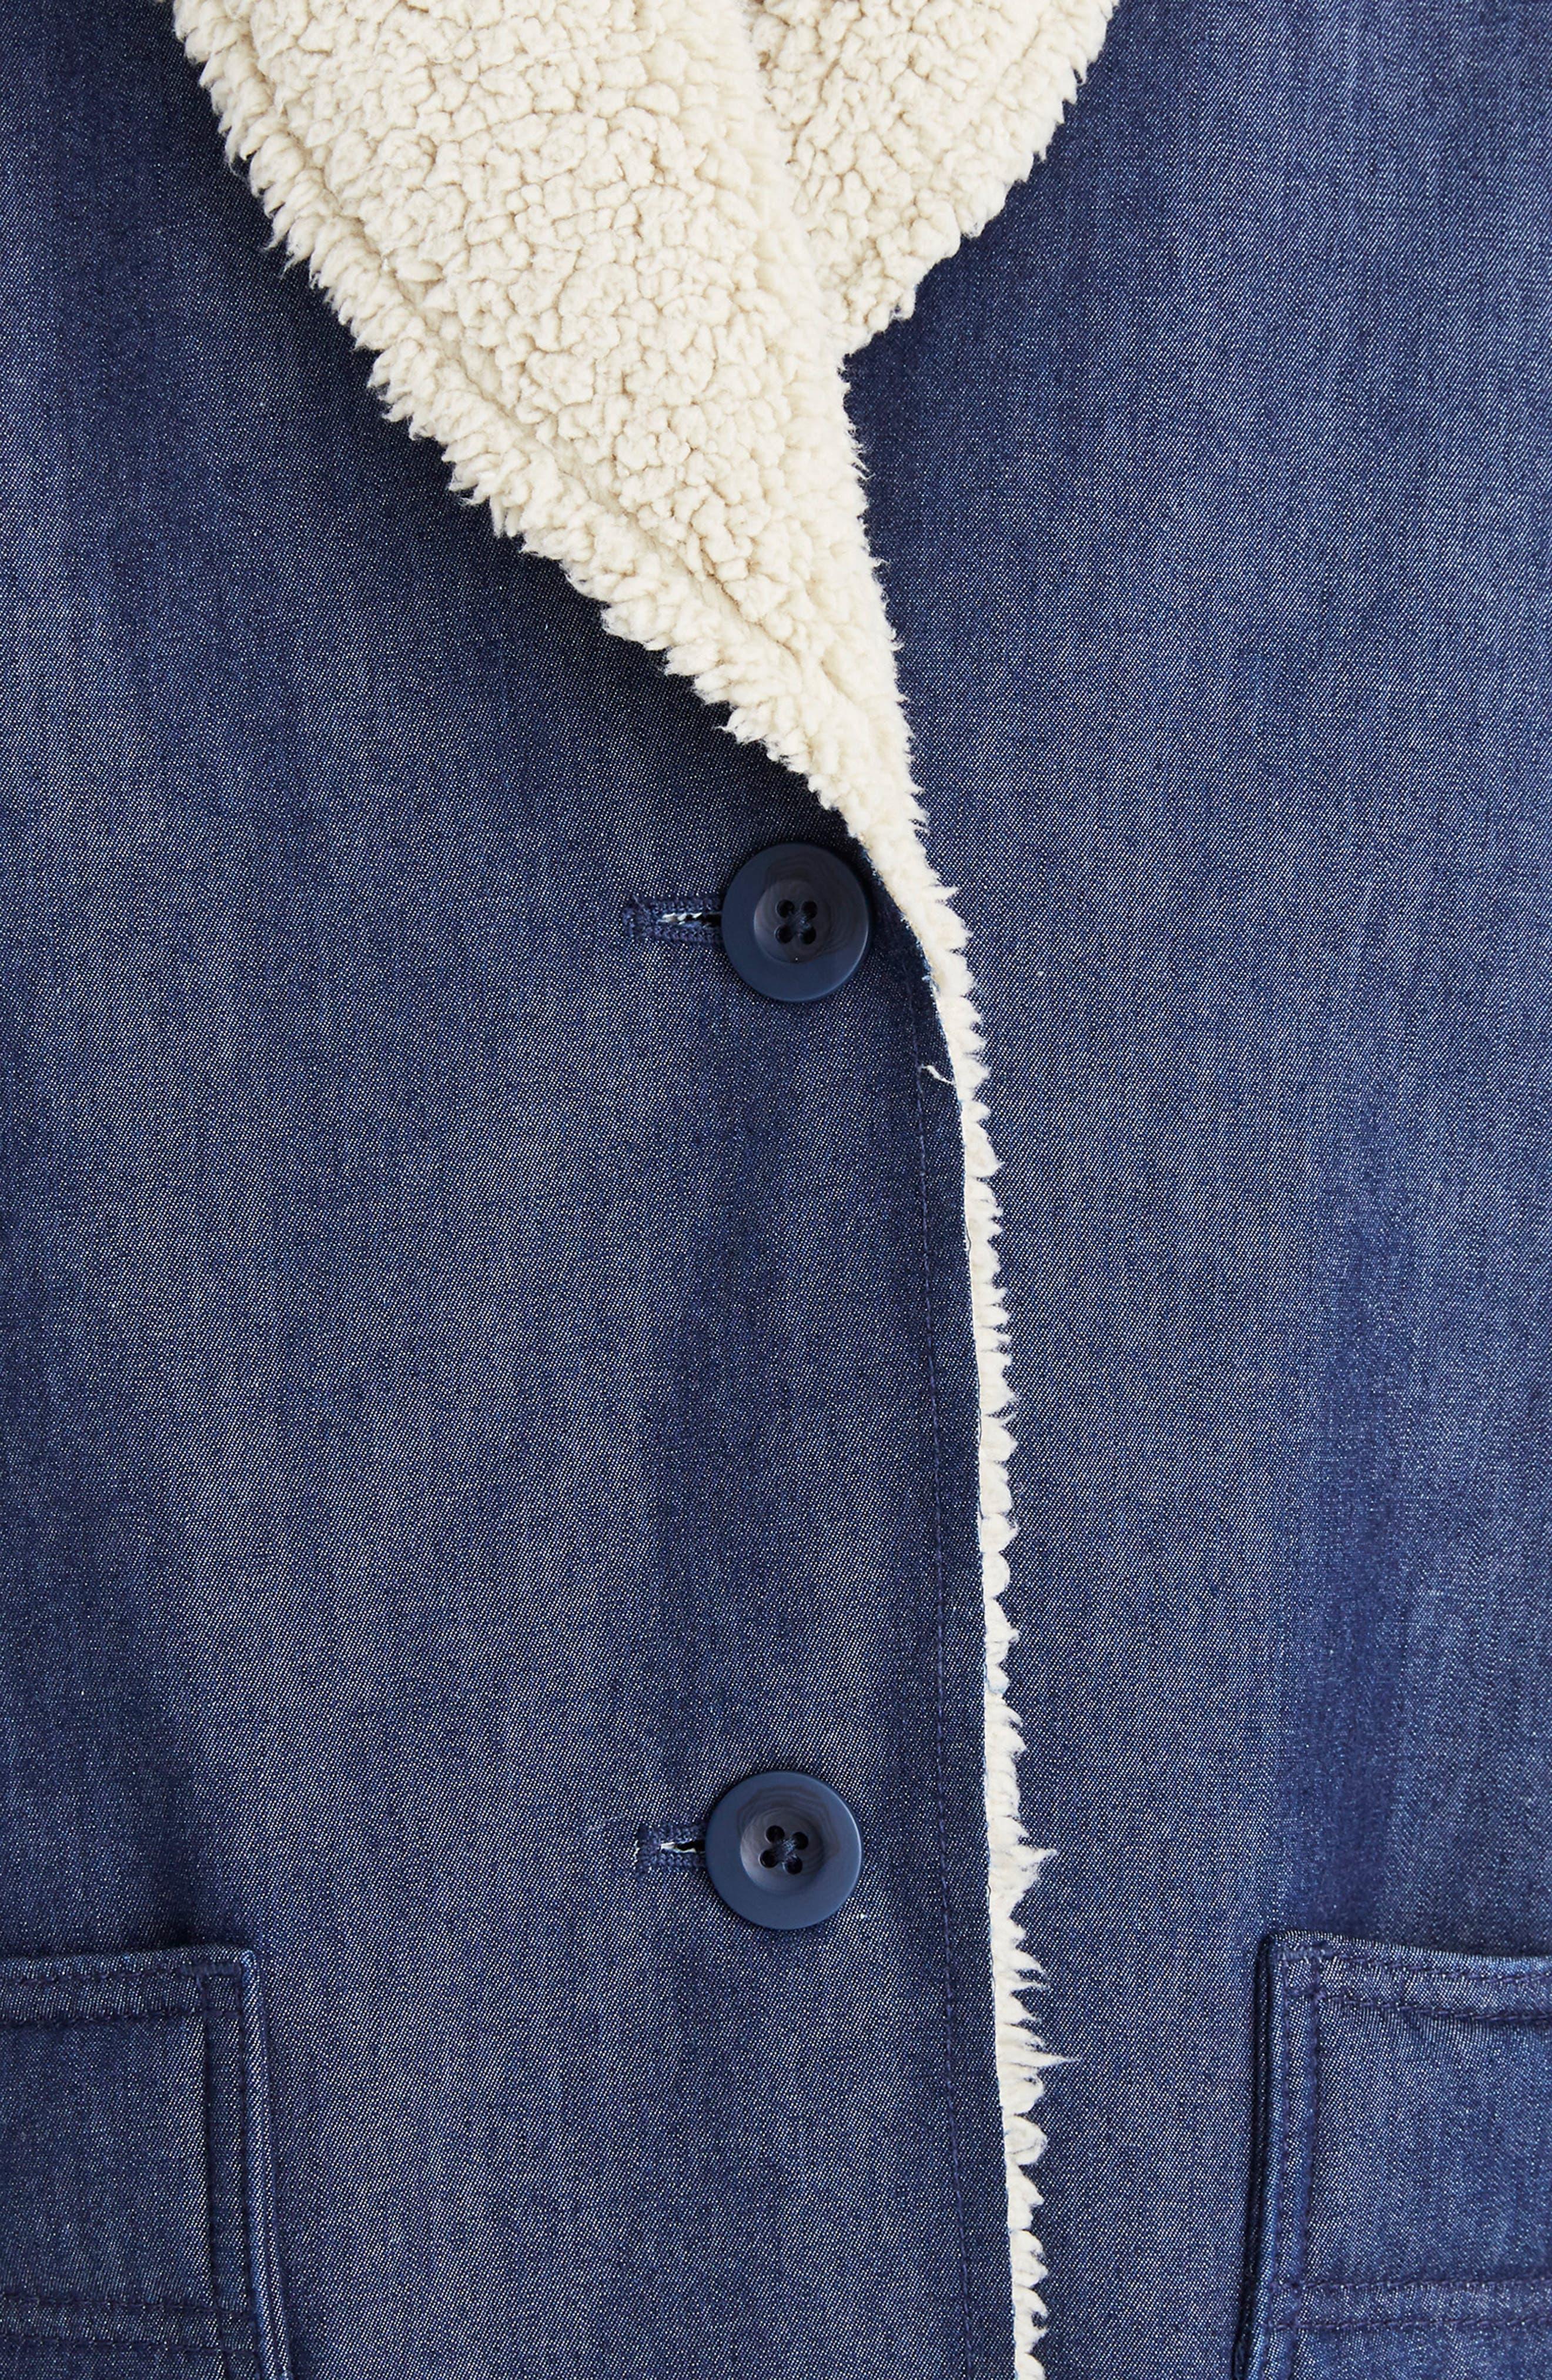 MADEWELL, Fleece Trim Denim Cocoon Coat, Alternate thumbnail 5, color, BRUNSWICK WASH